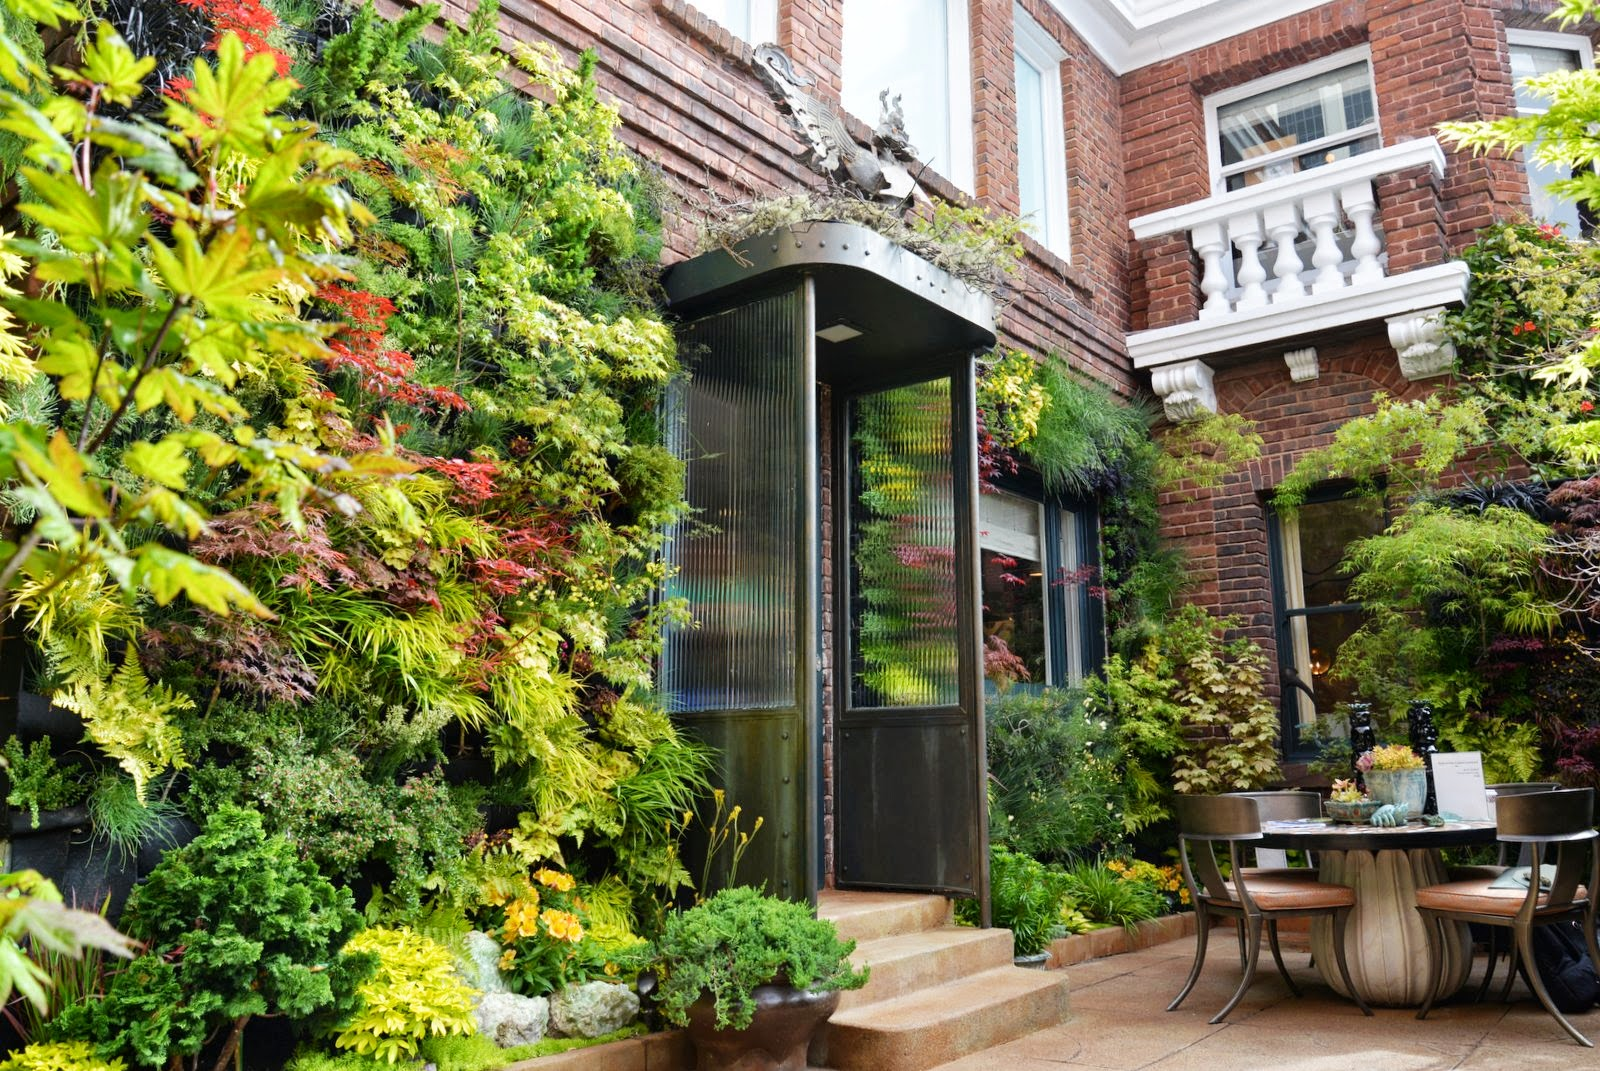 Fullsize Of Vertical Window Gardens